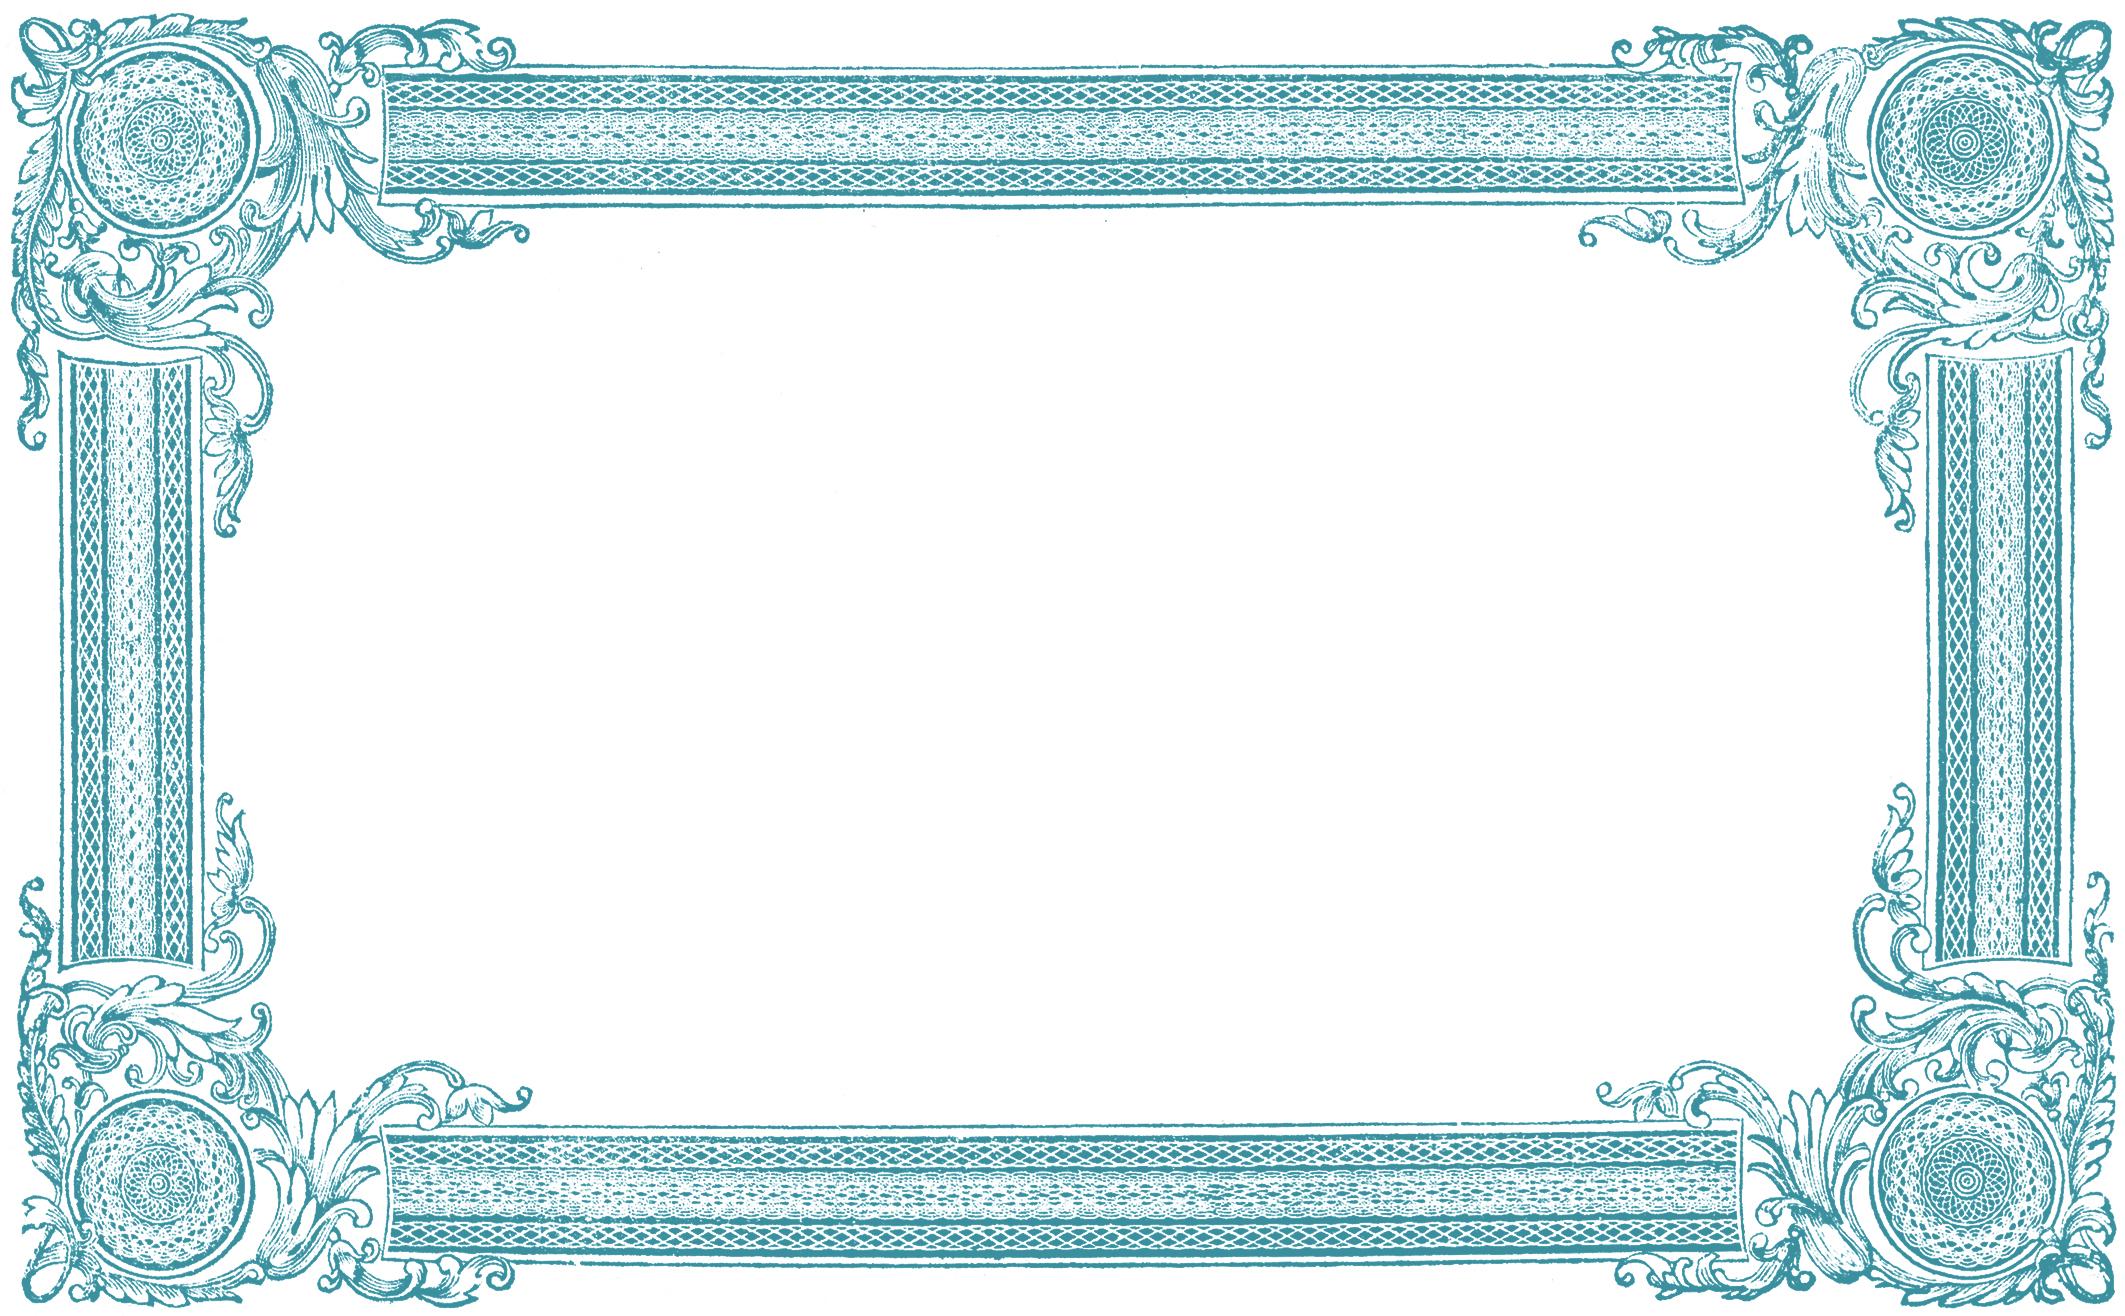 Free clip art frames - Clipar - Free Clipart Frames